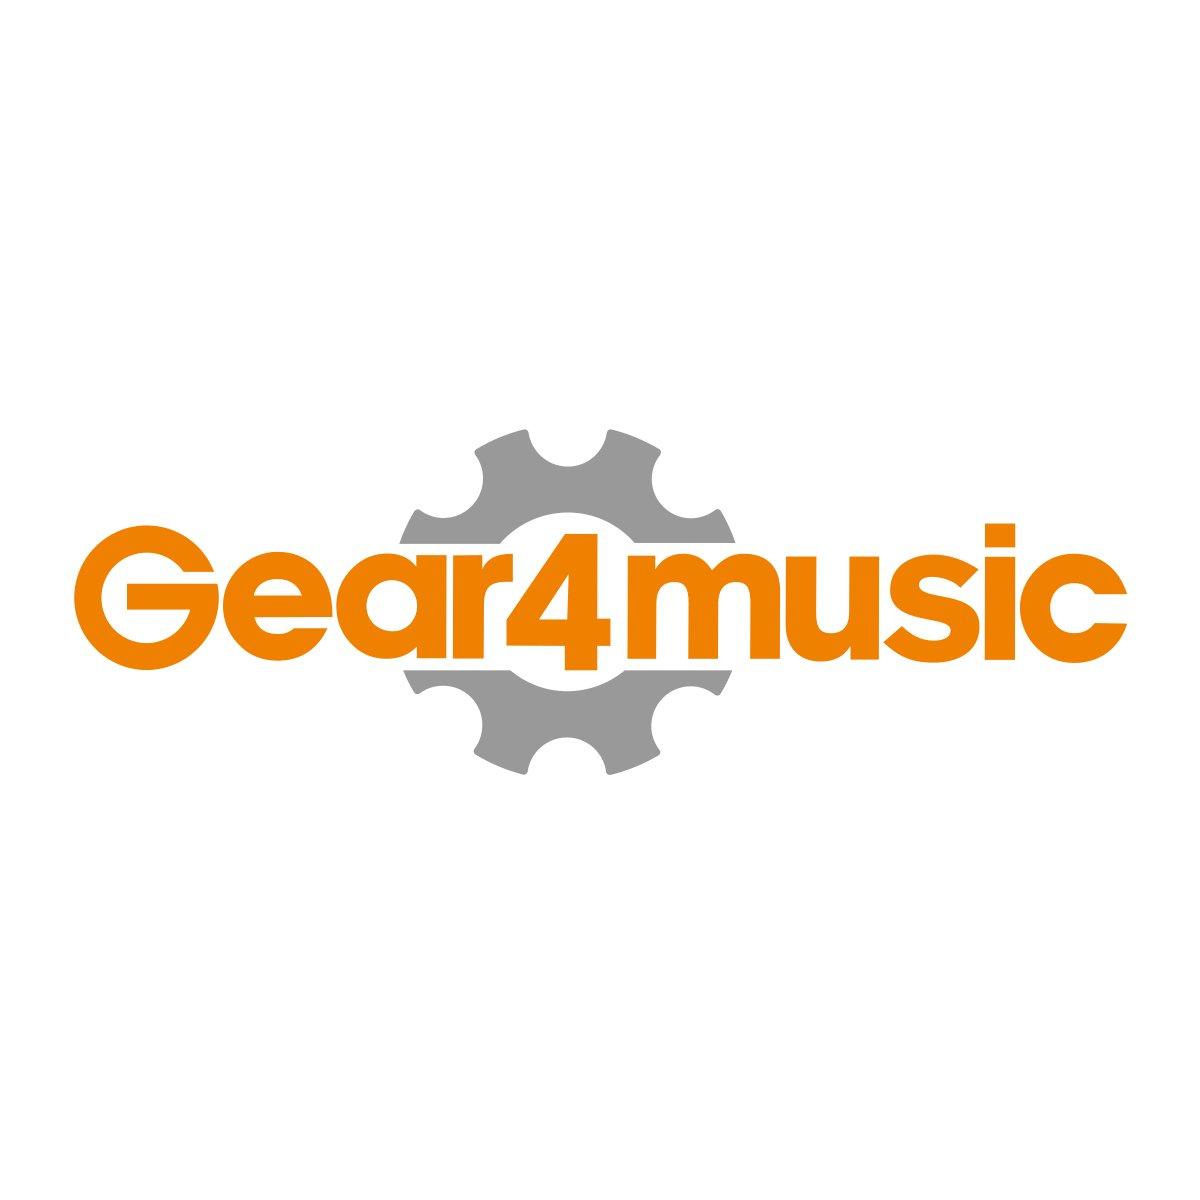 Student Cornet by Gear4music Light Gold